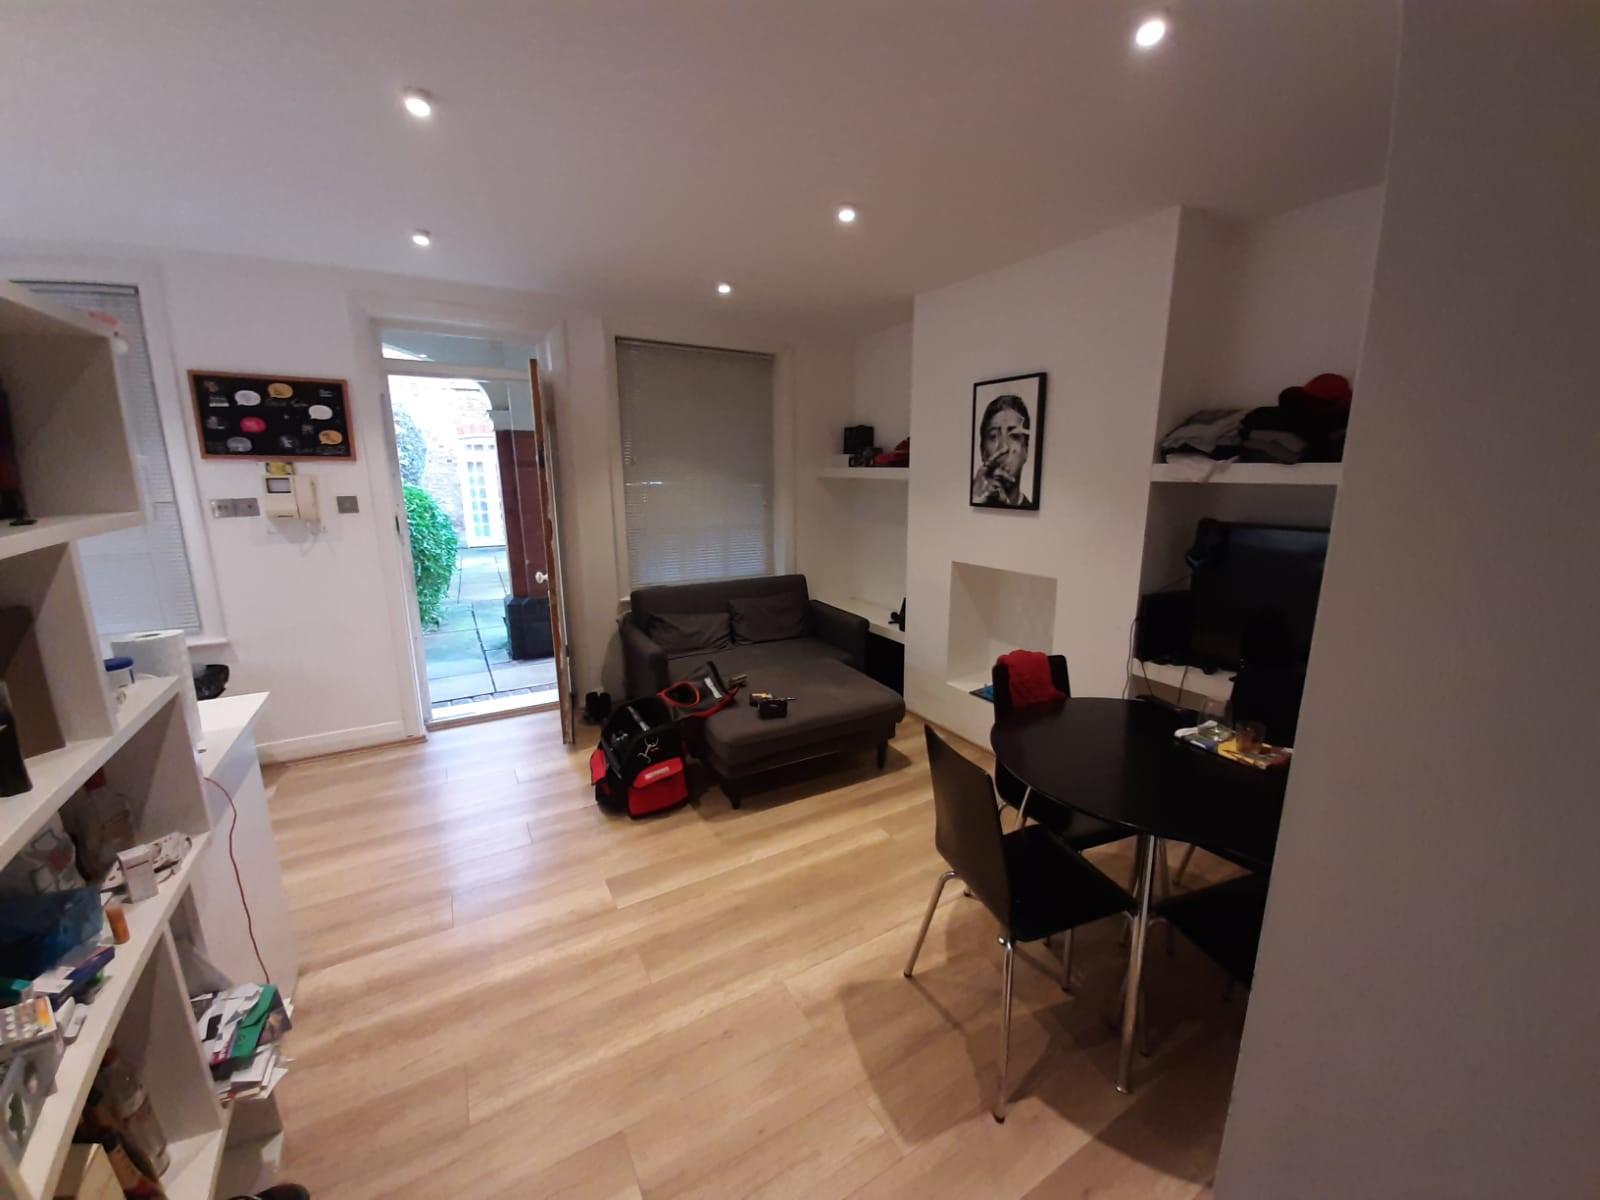 2 Bedroom Flat In The Heart of St John's Wood